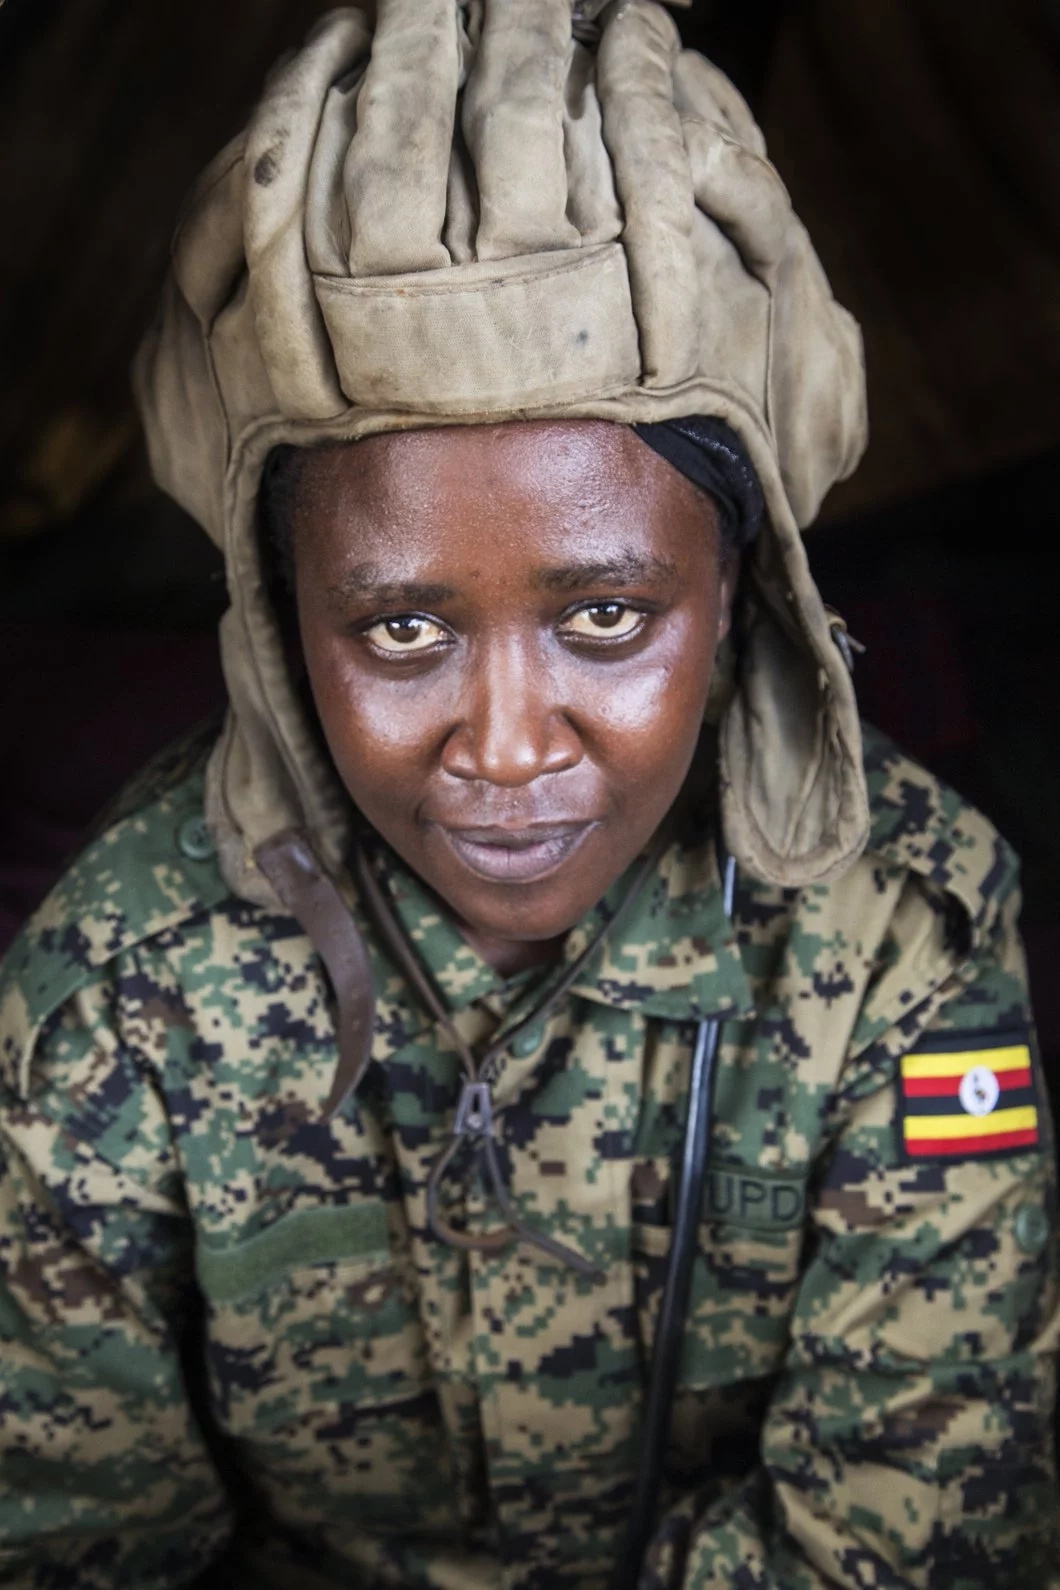 The beautiful soldier girls fighting al-Shabaab